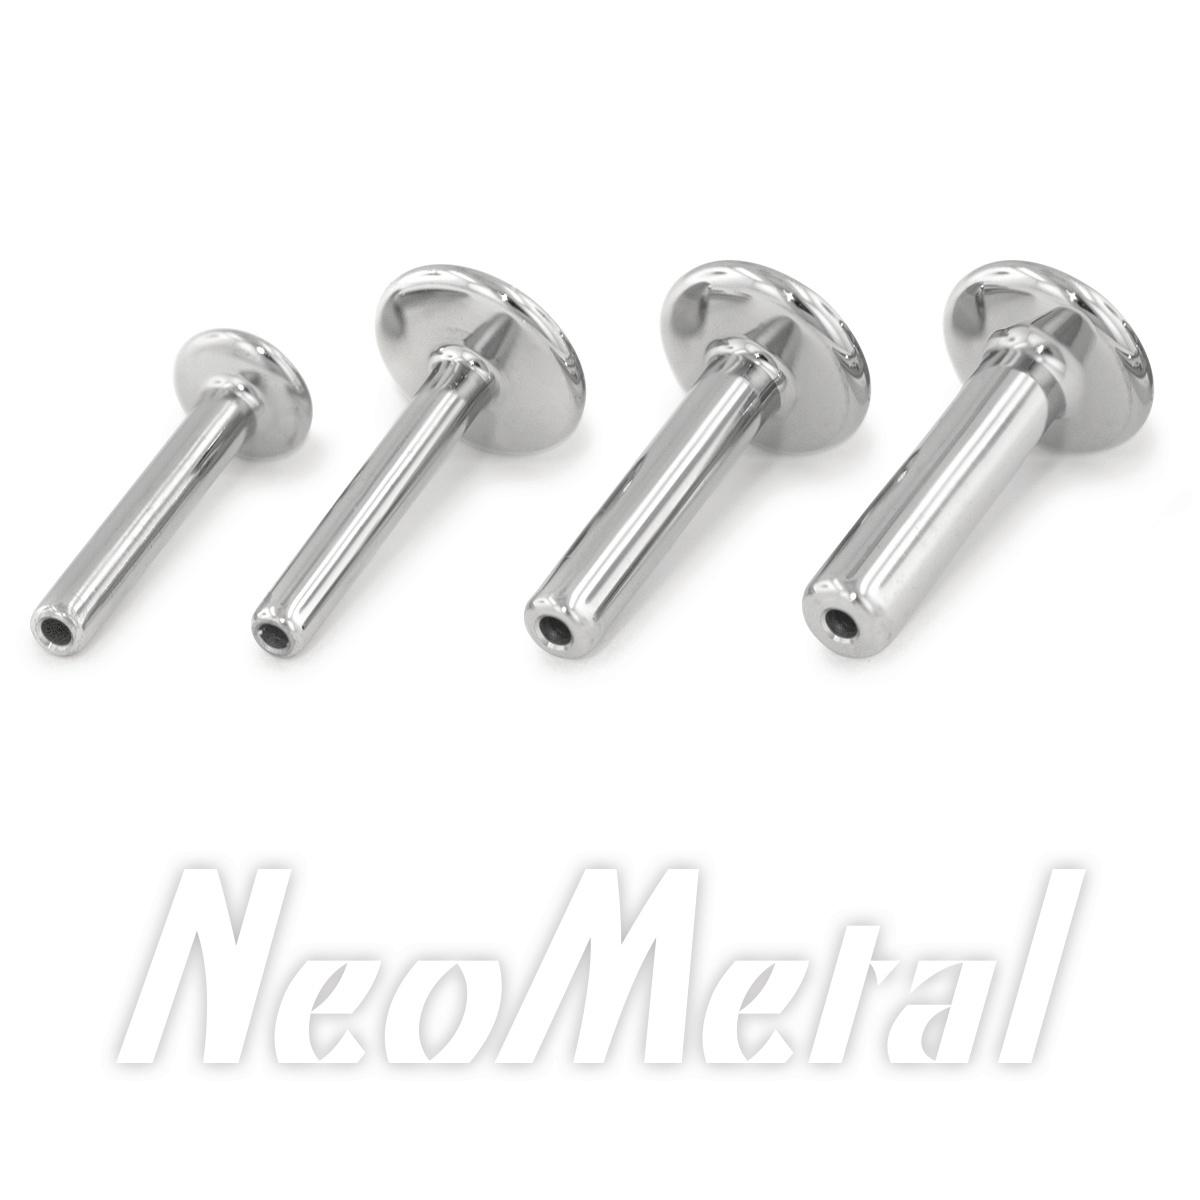 Body Jewelry Manufacturer   NeoMetal Inc